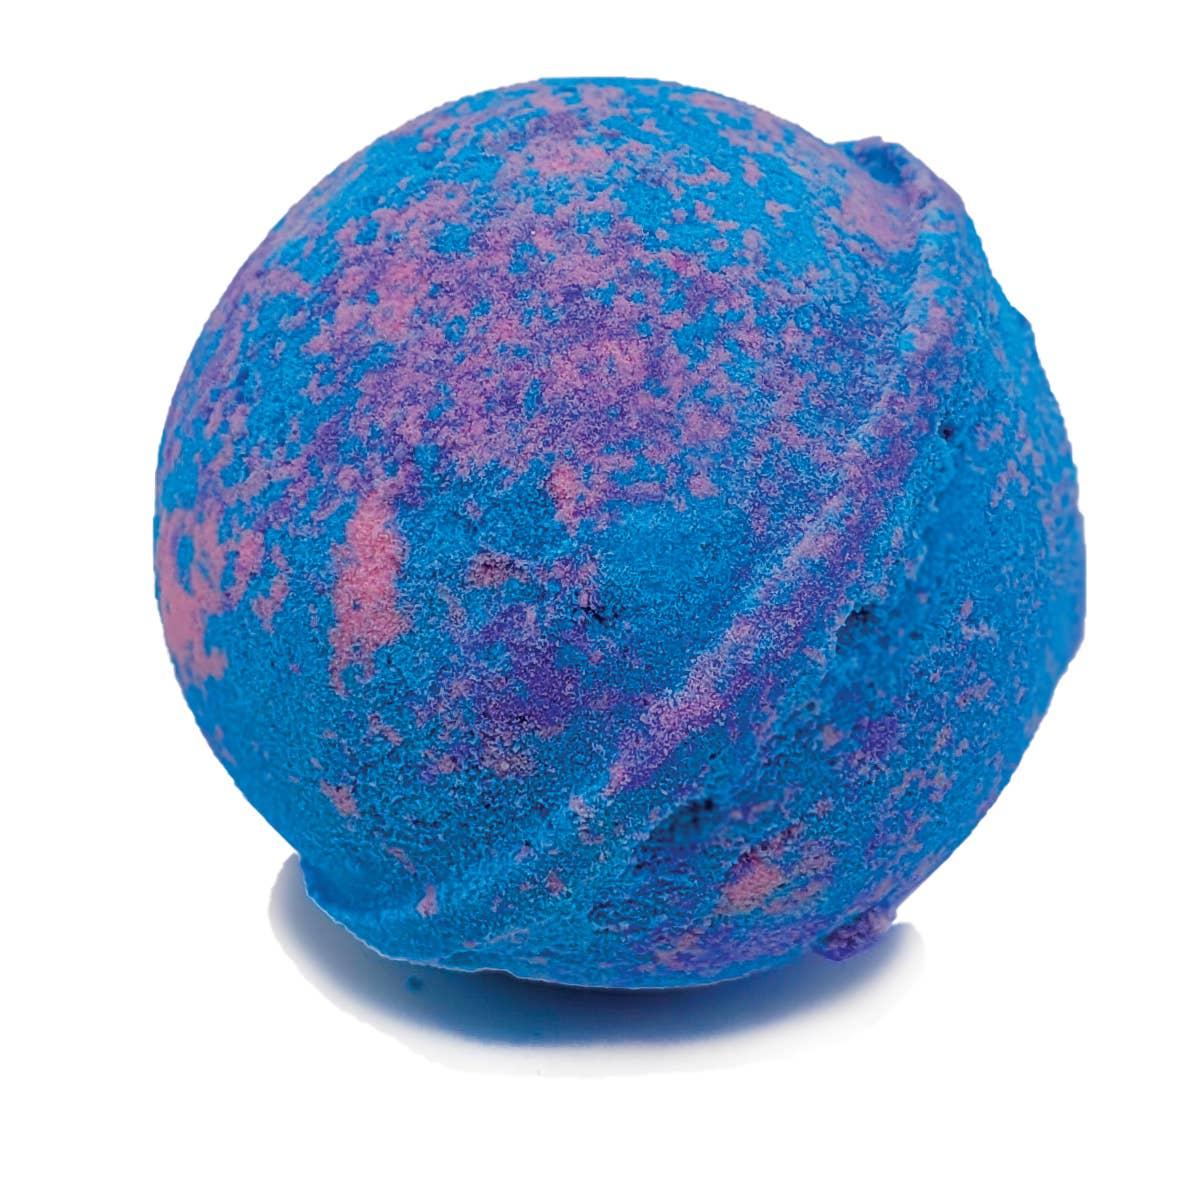 Evolve - Bath Bomb - Rainbows & Unicorns | Trada Marketplace